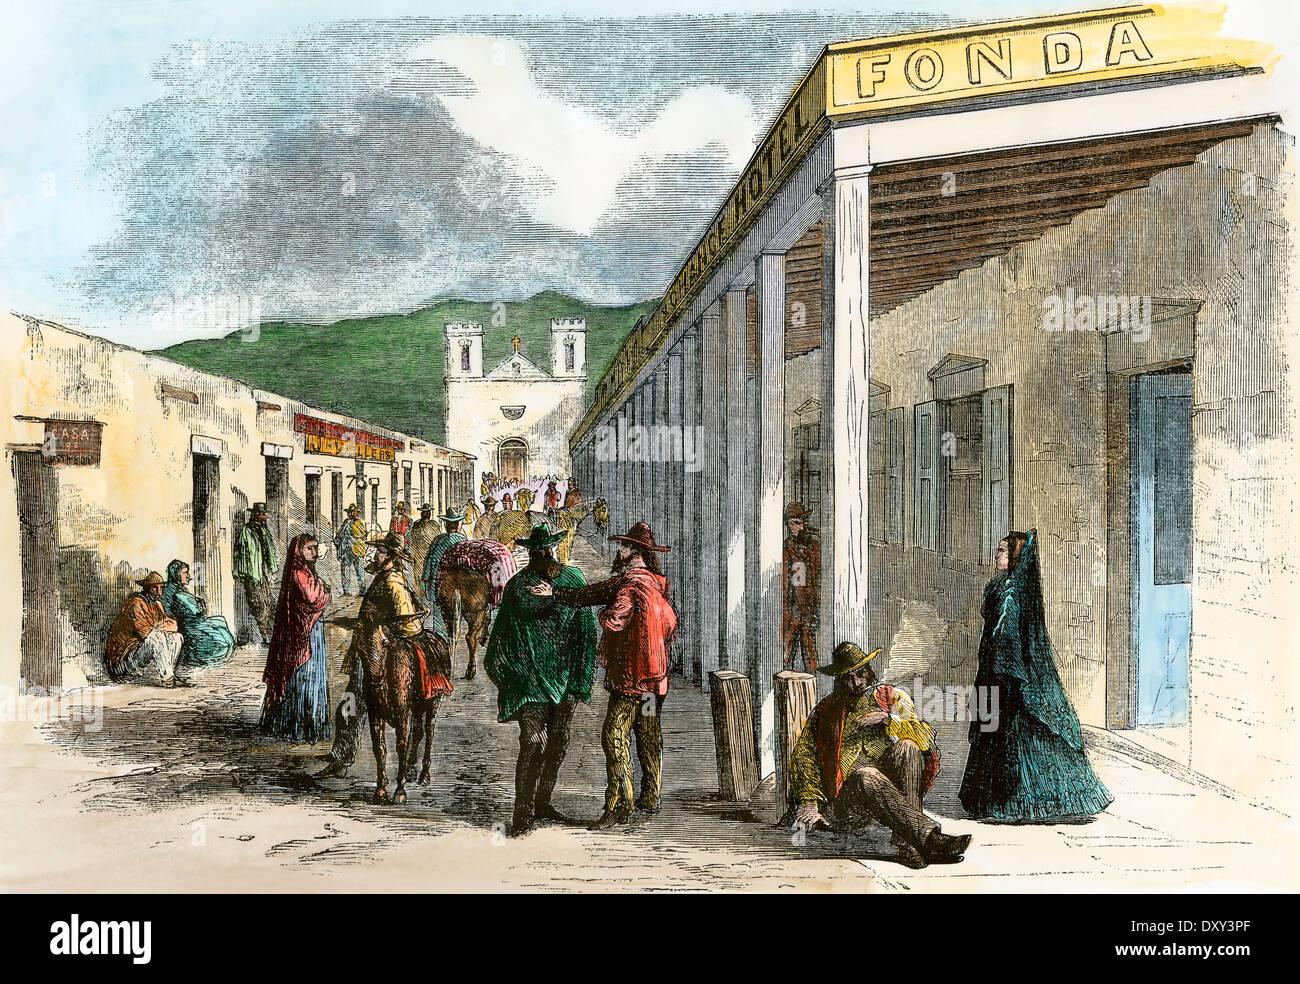 La Fonda Hotel, Blick vom Plaza St Francis Cathedral, Santa Fe, NM, 1860er Jahre. Stockbild